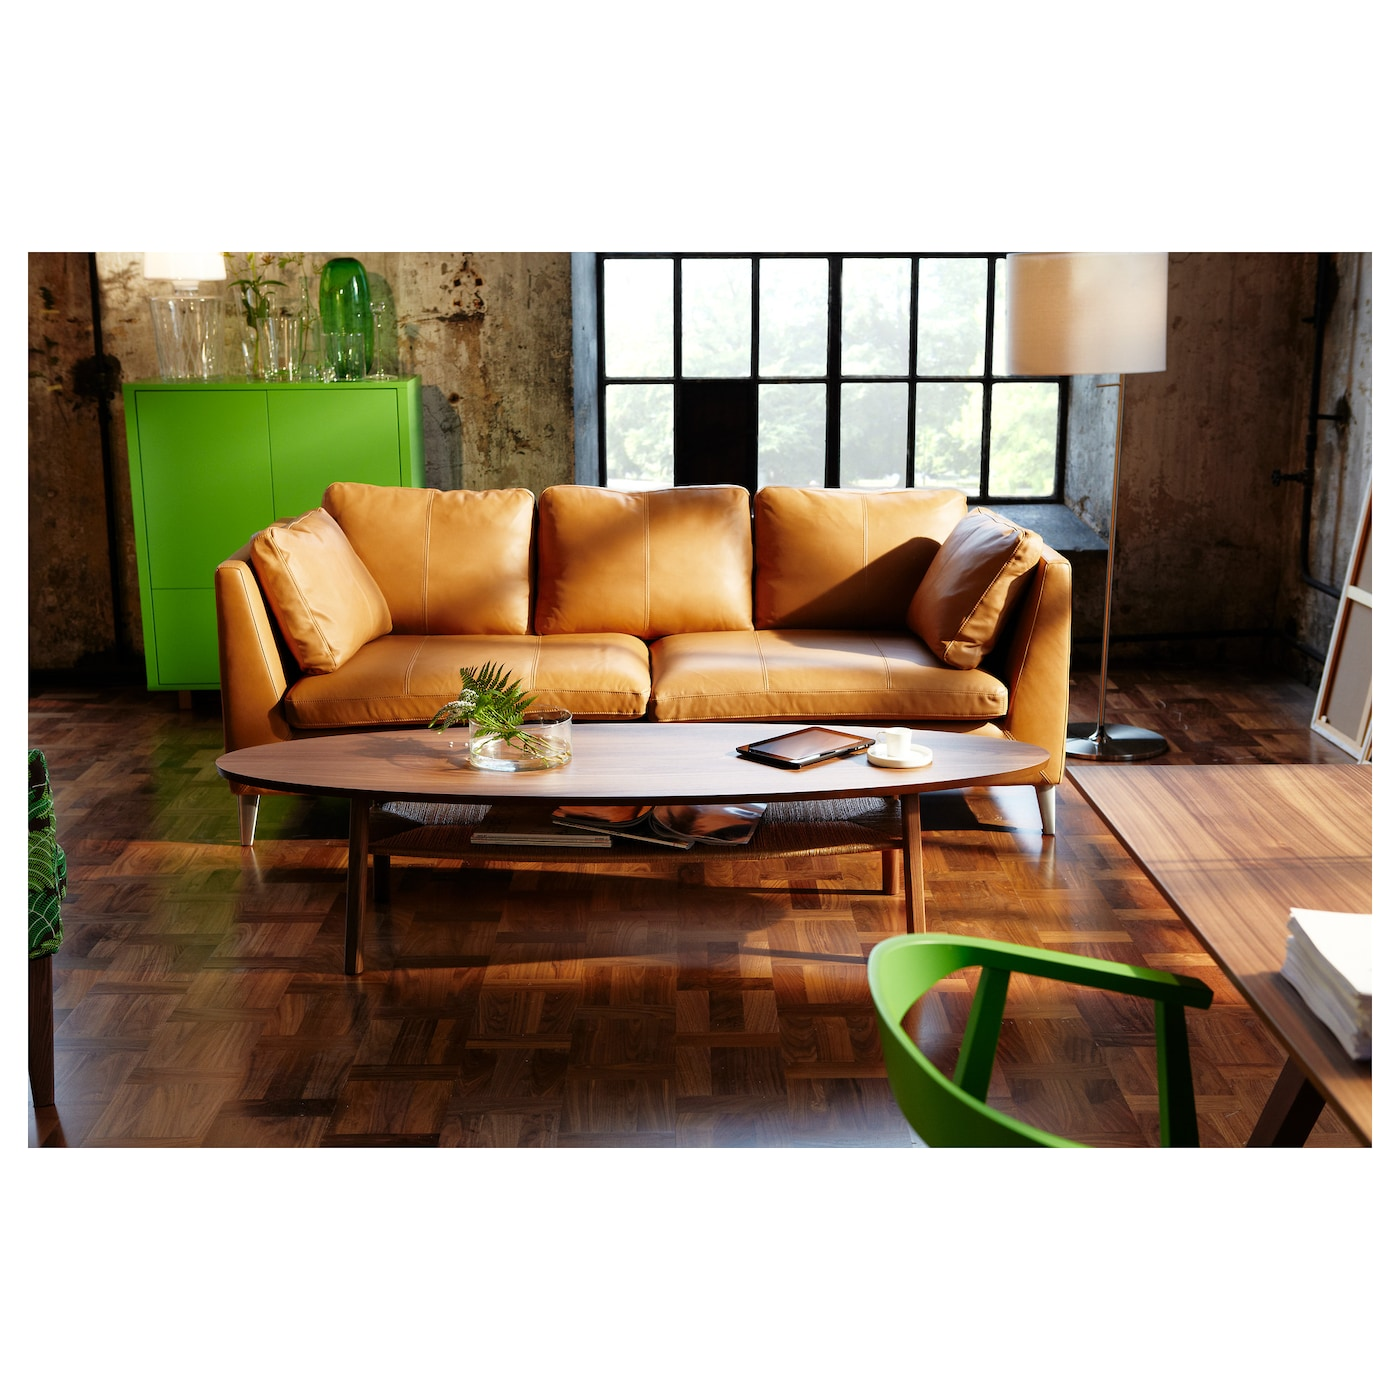 Inside Design Salontafel.Stockholm Coffee Table Walnut Veneer 70 7 8x23 1 4 Ikea